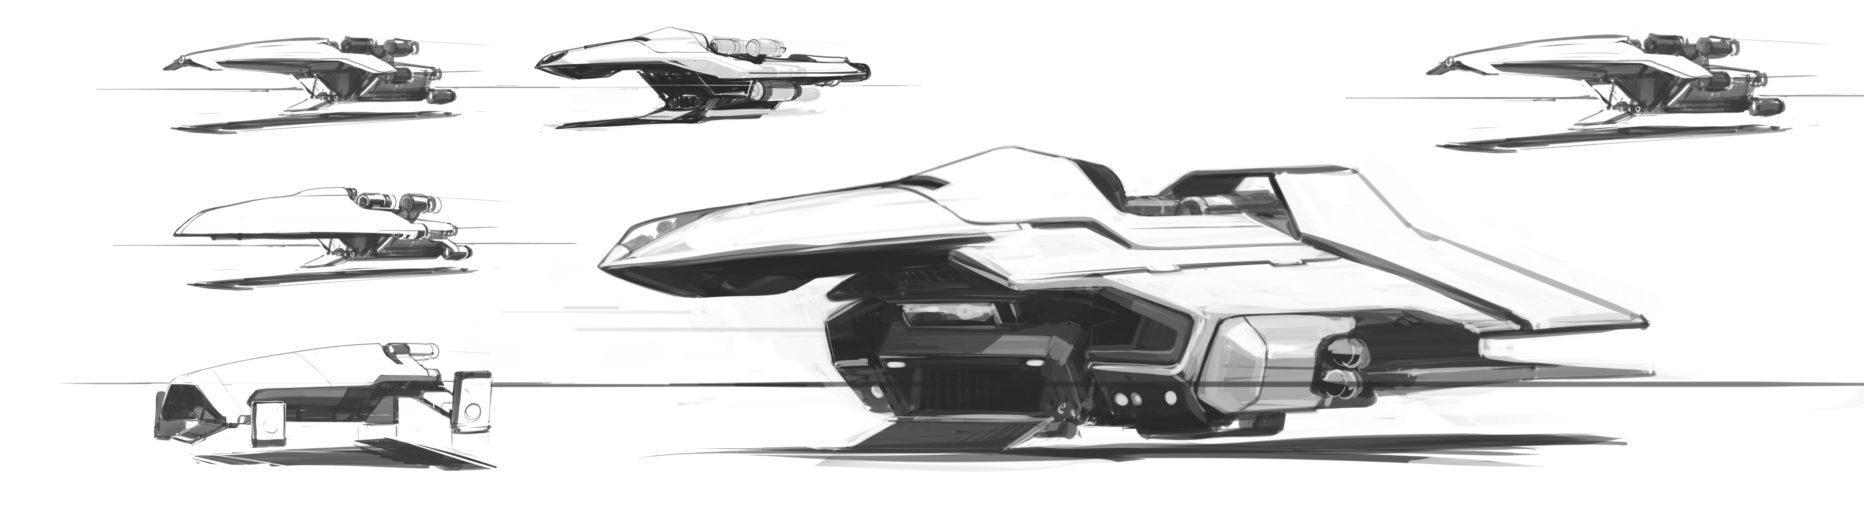 SC-Hercules-Concept-Art-13.jpg